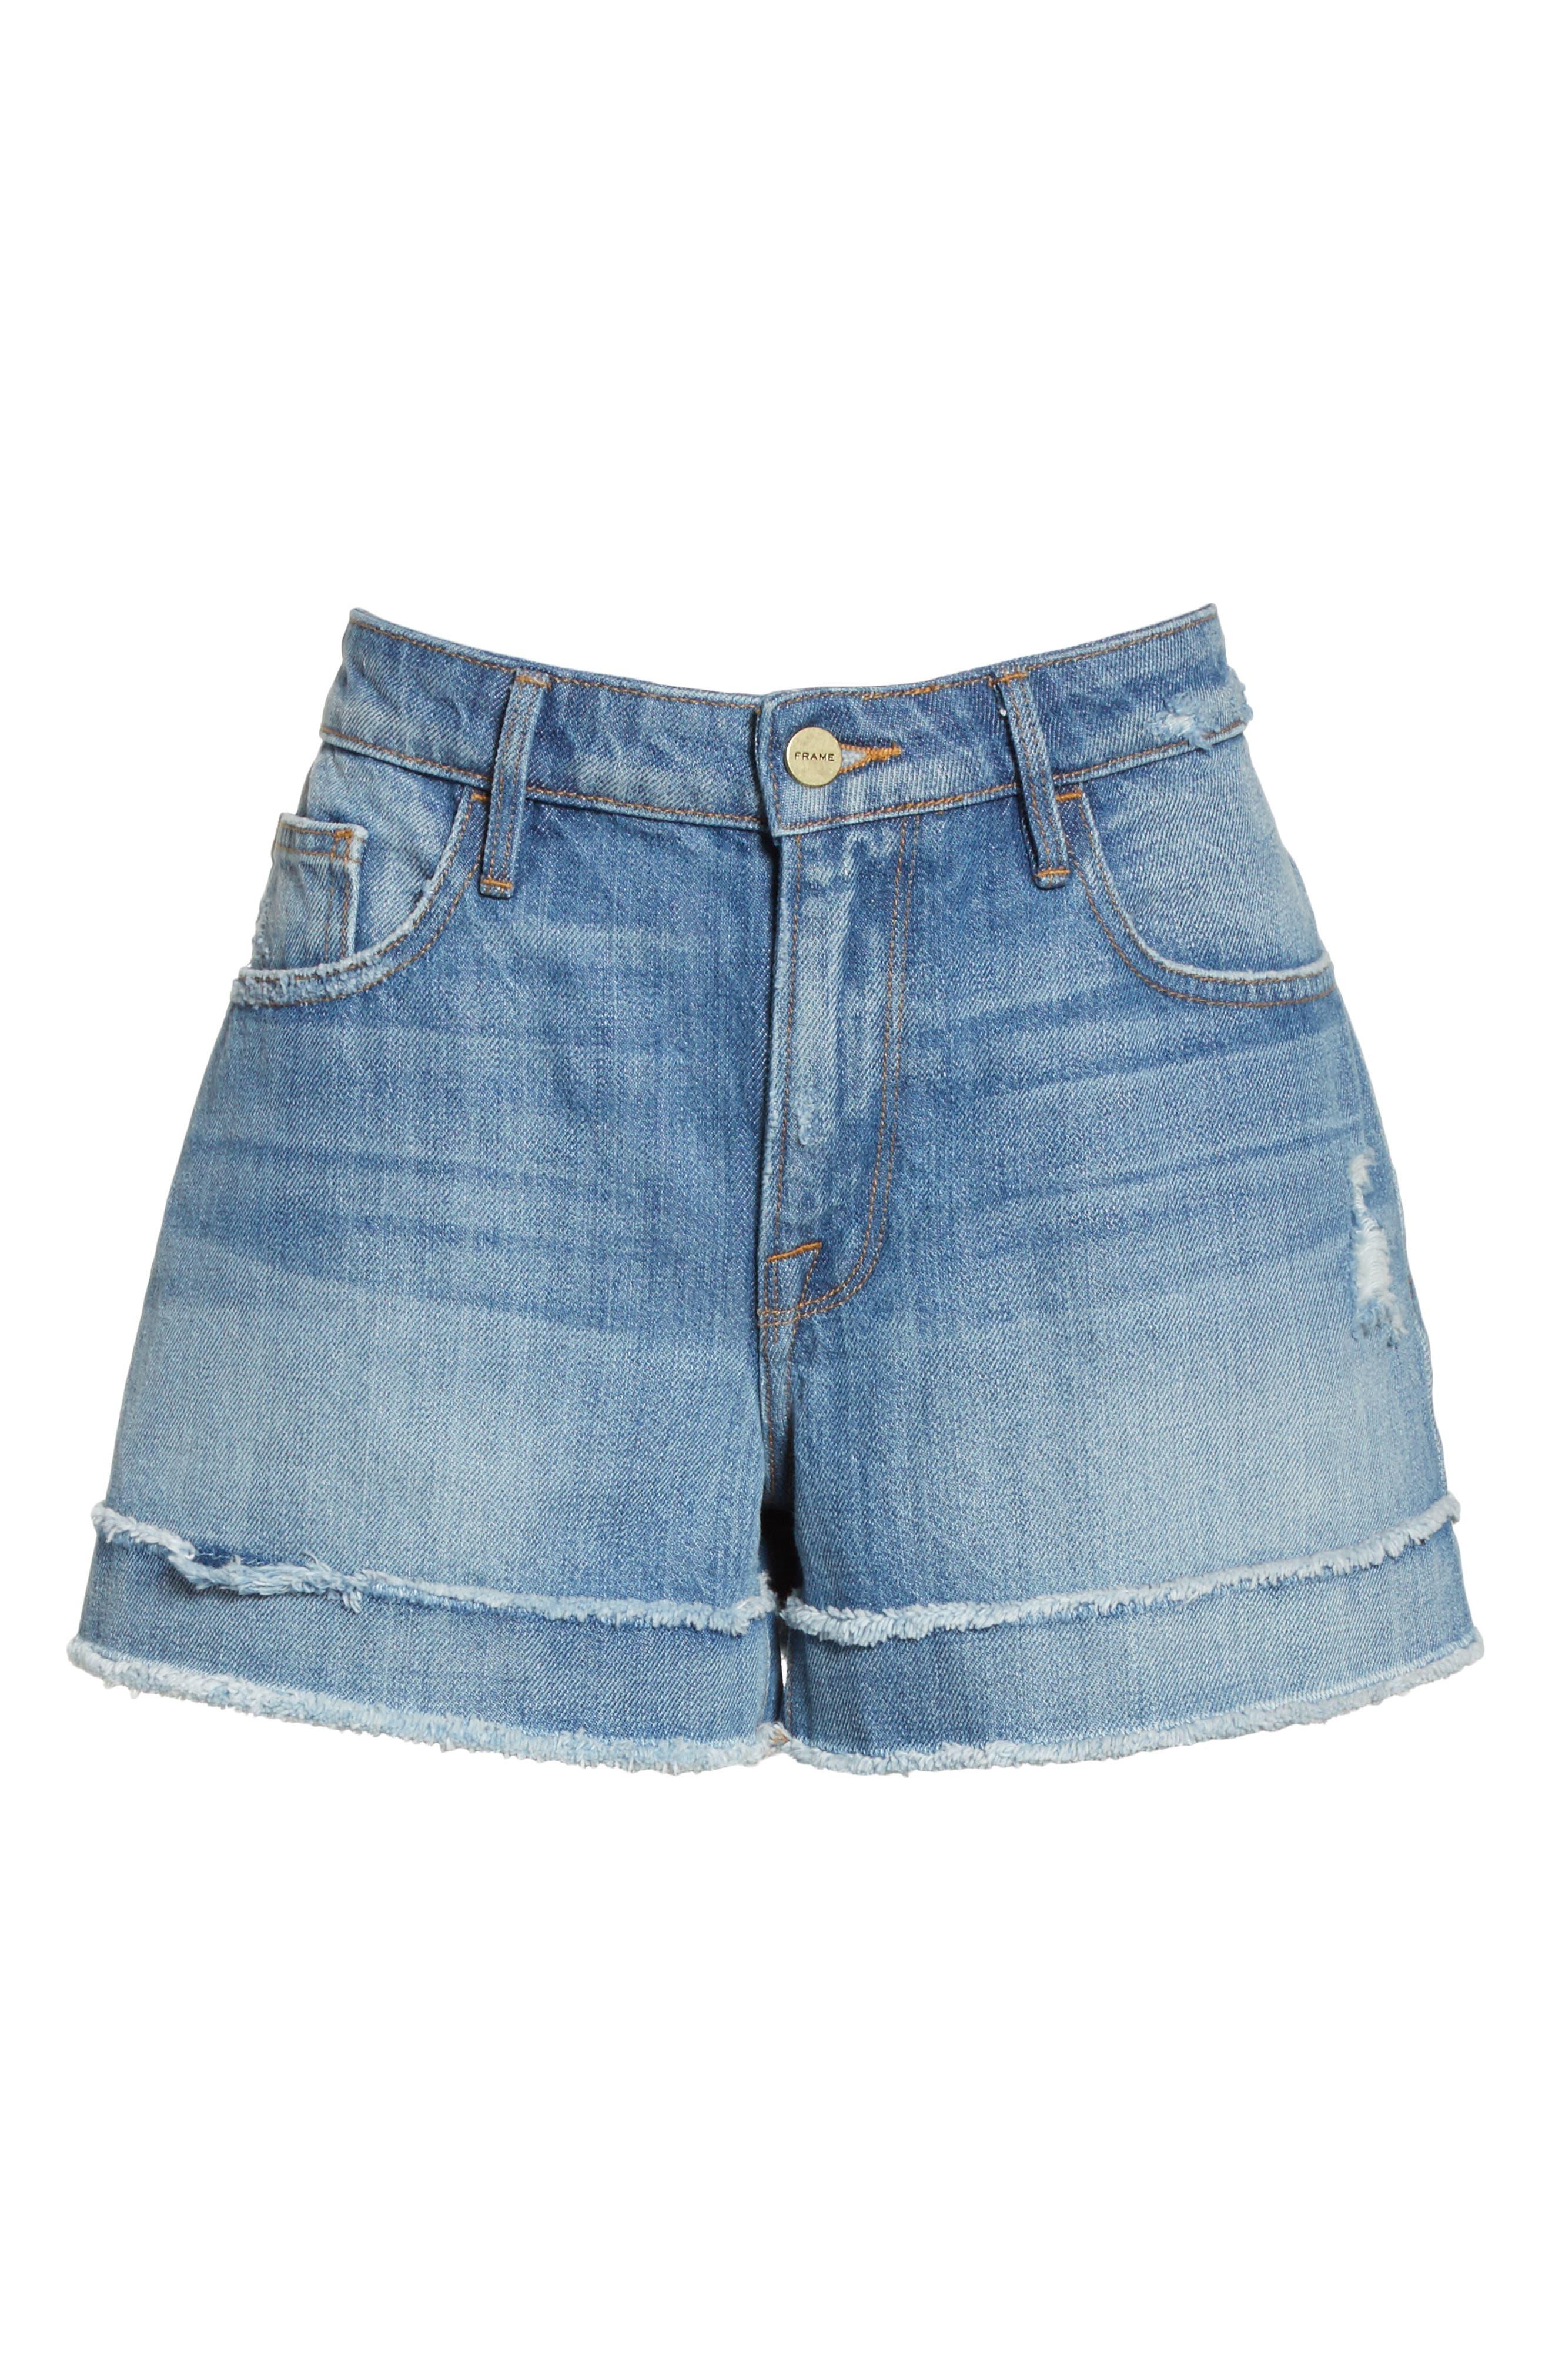 Le Grand Garçon Fray Cuff Denim Shorts,                             Alternate thumbnail 6, color,                             420